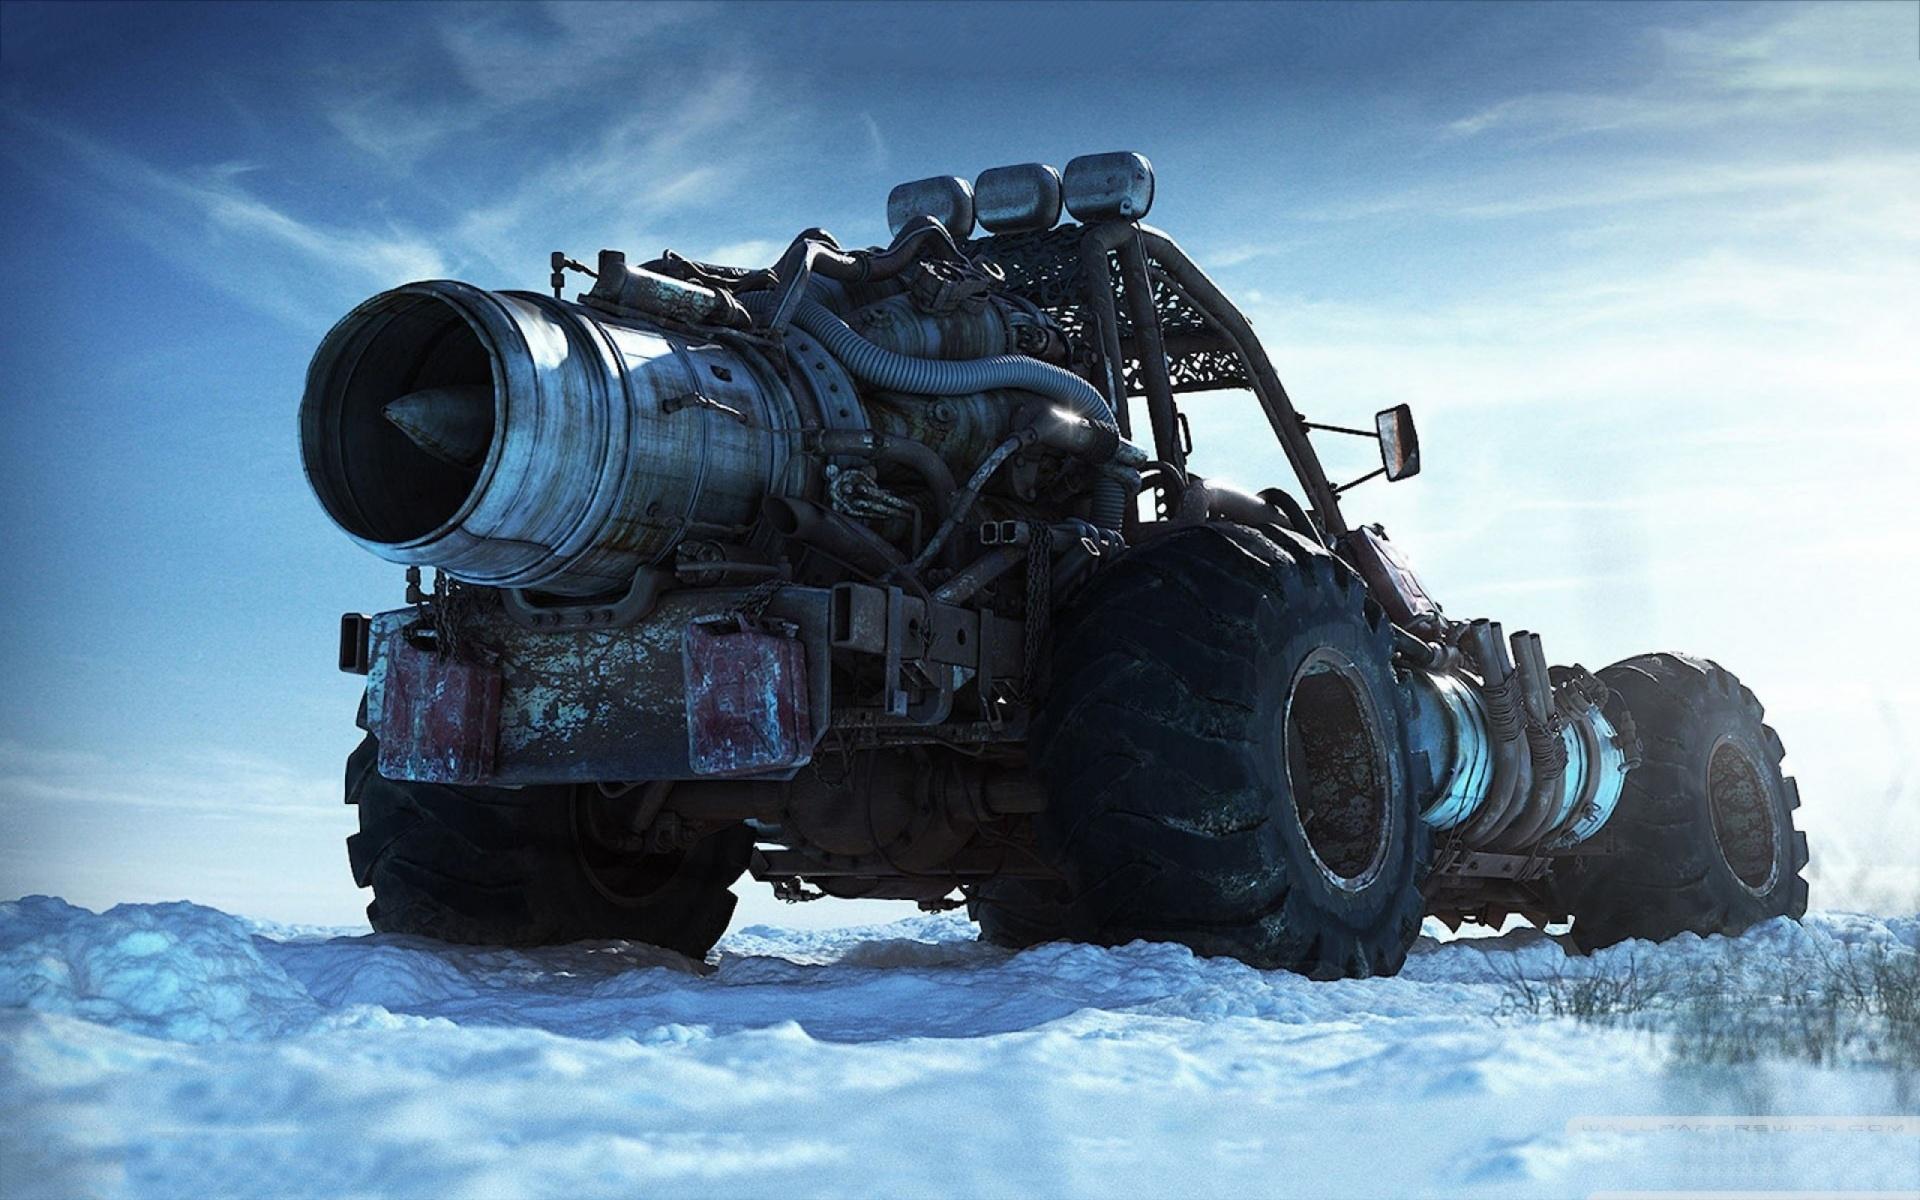 Big Jet Buggy